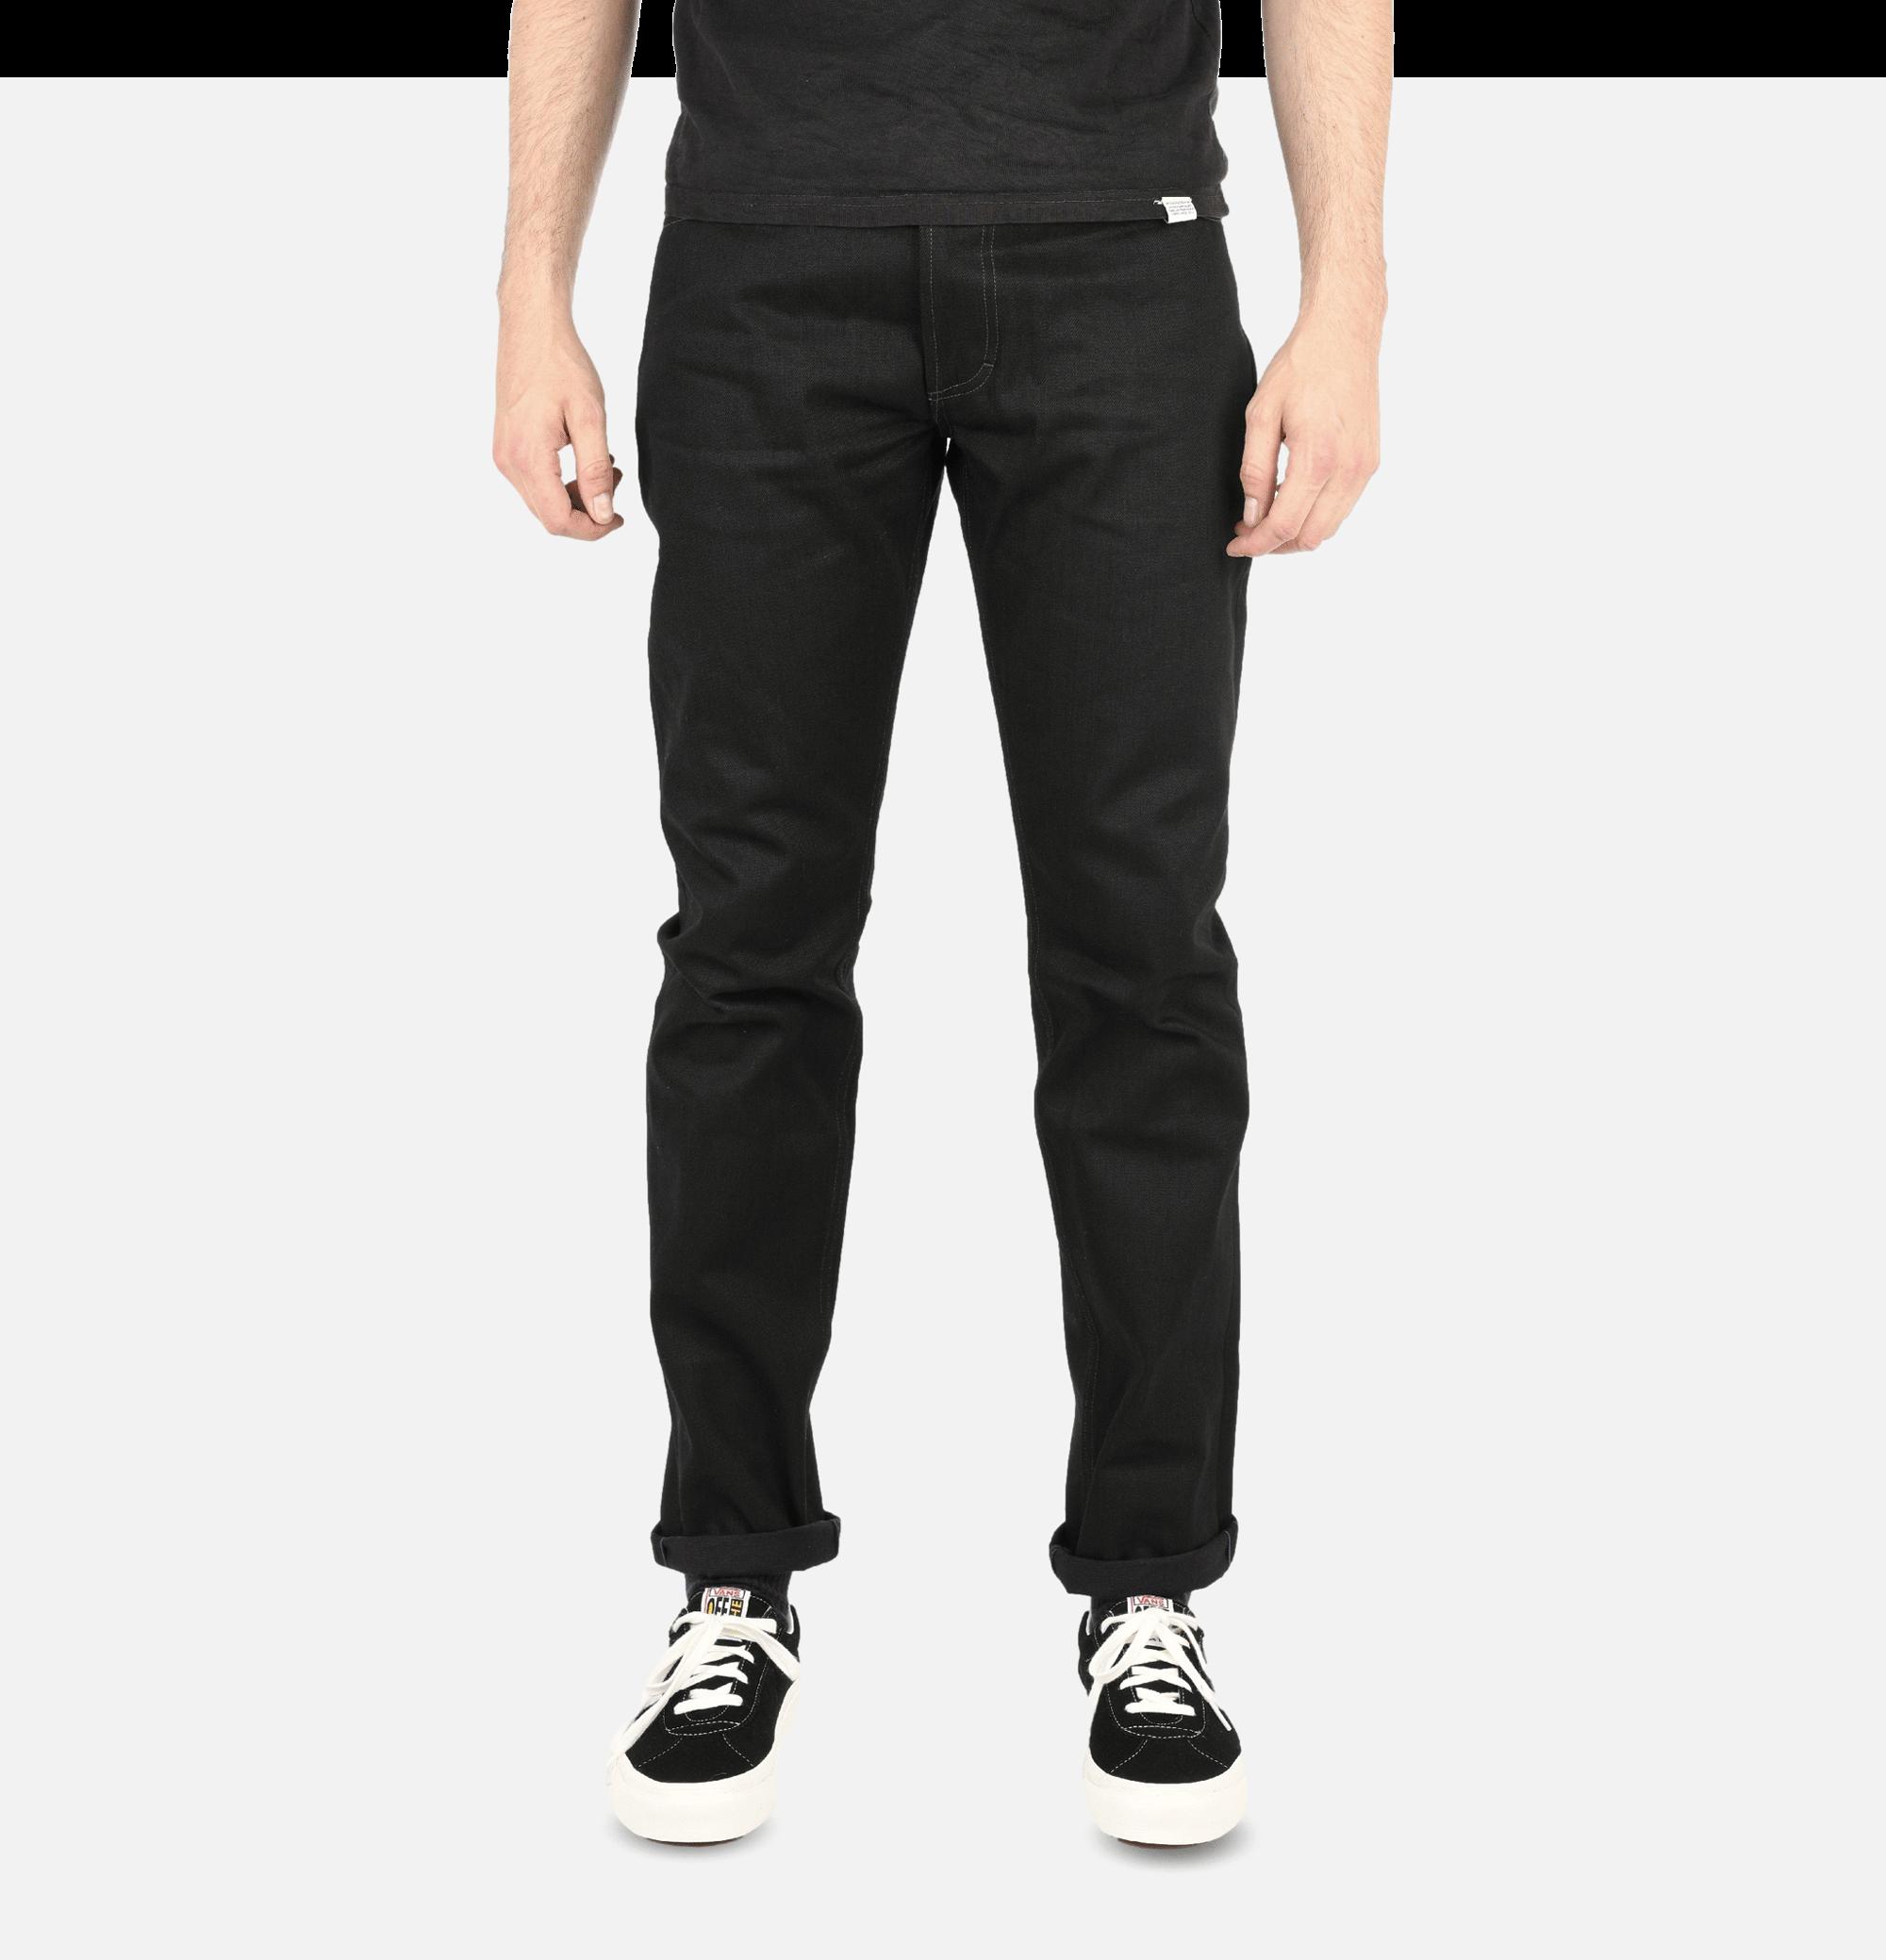 101 Rider Jeans Dry Black